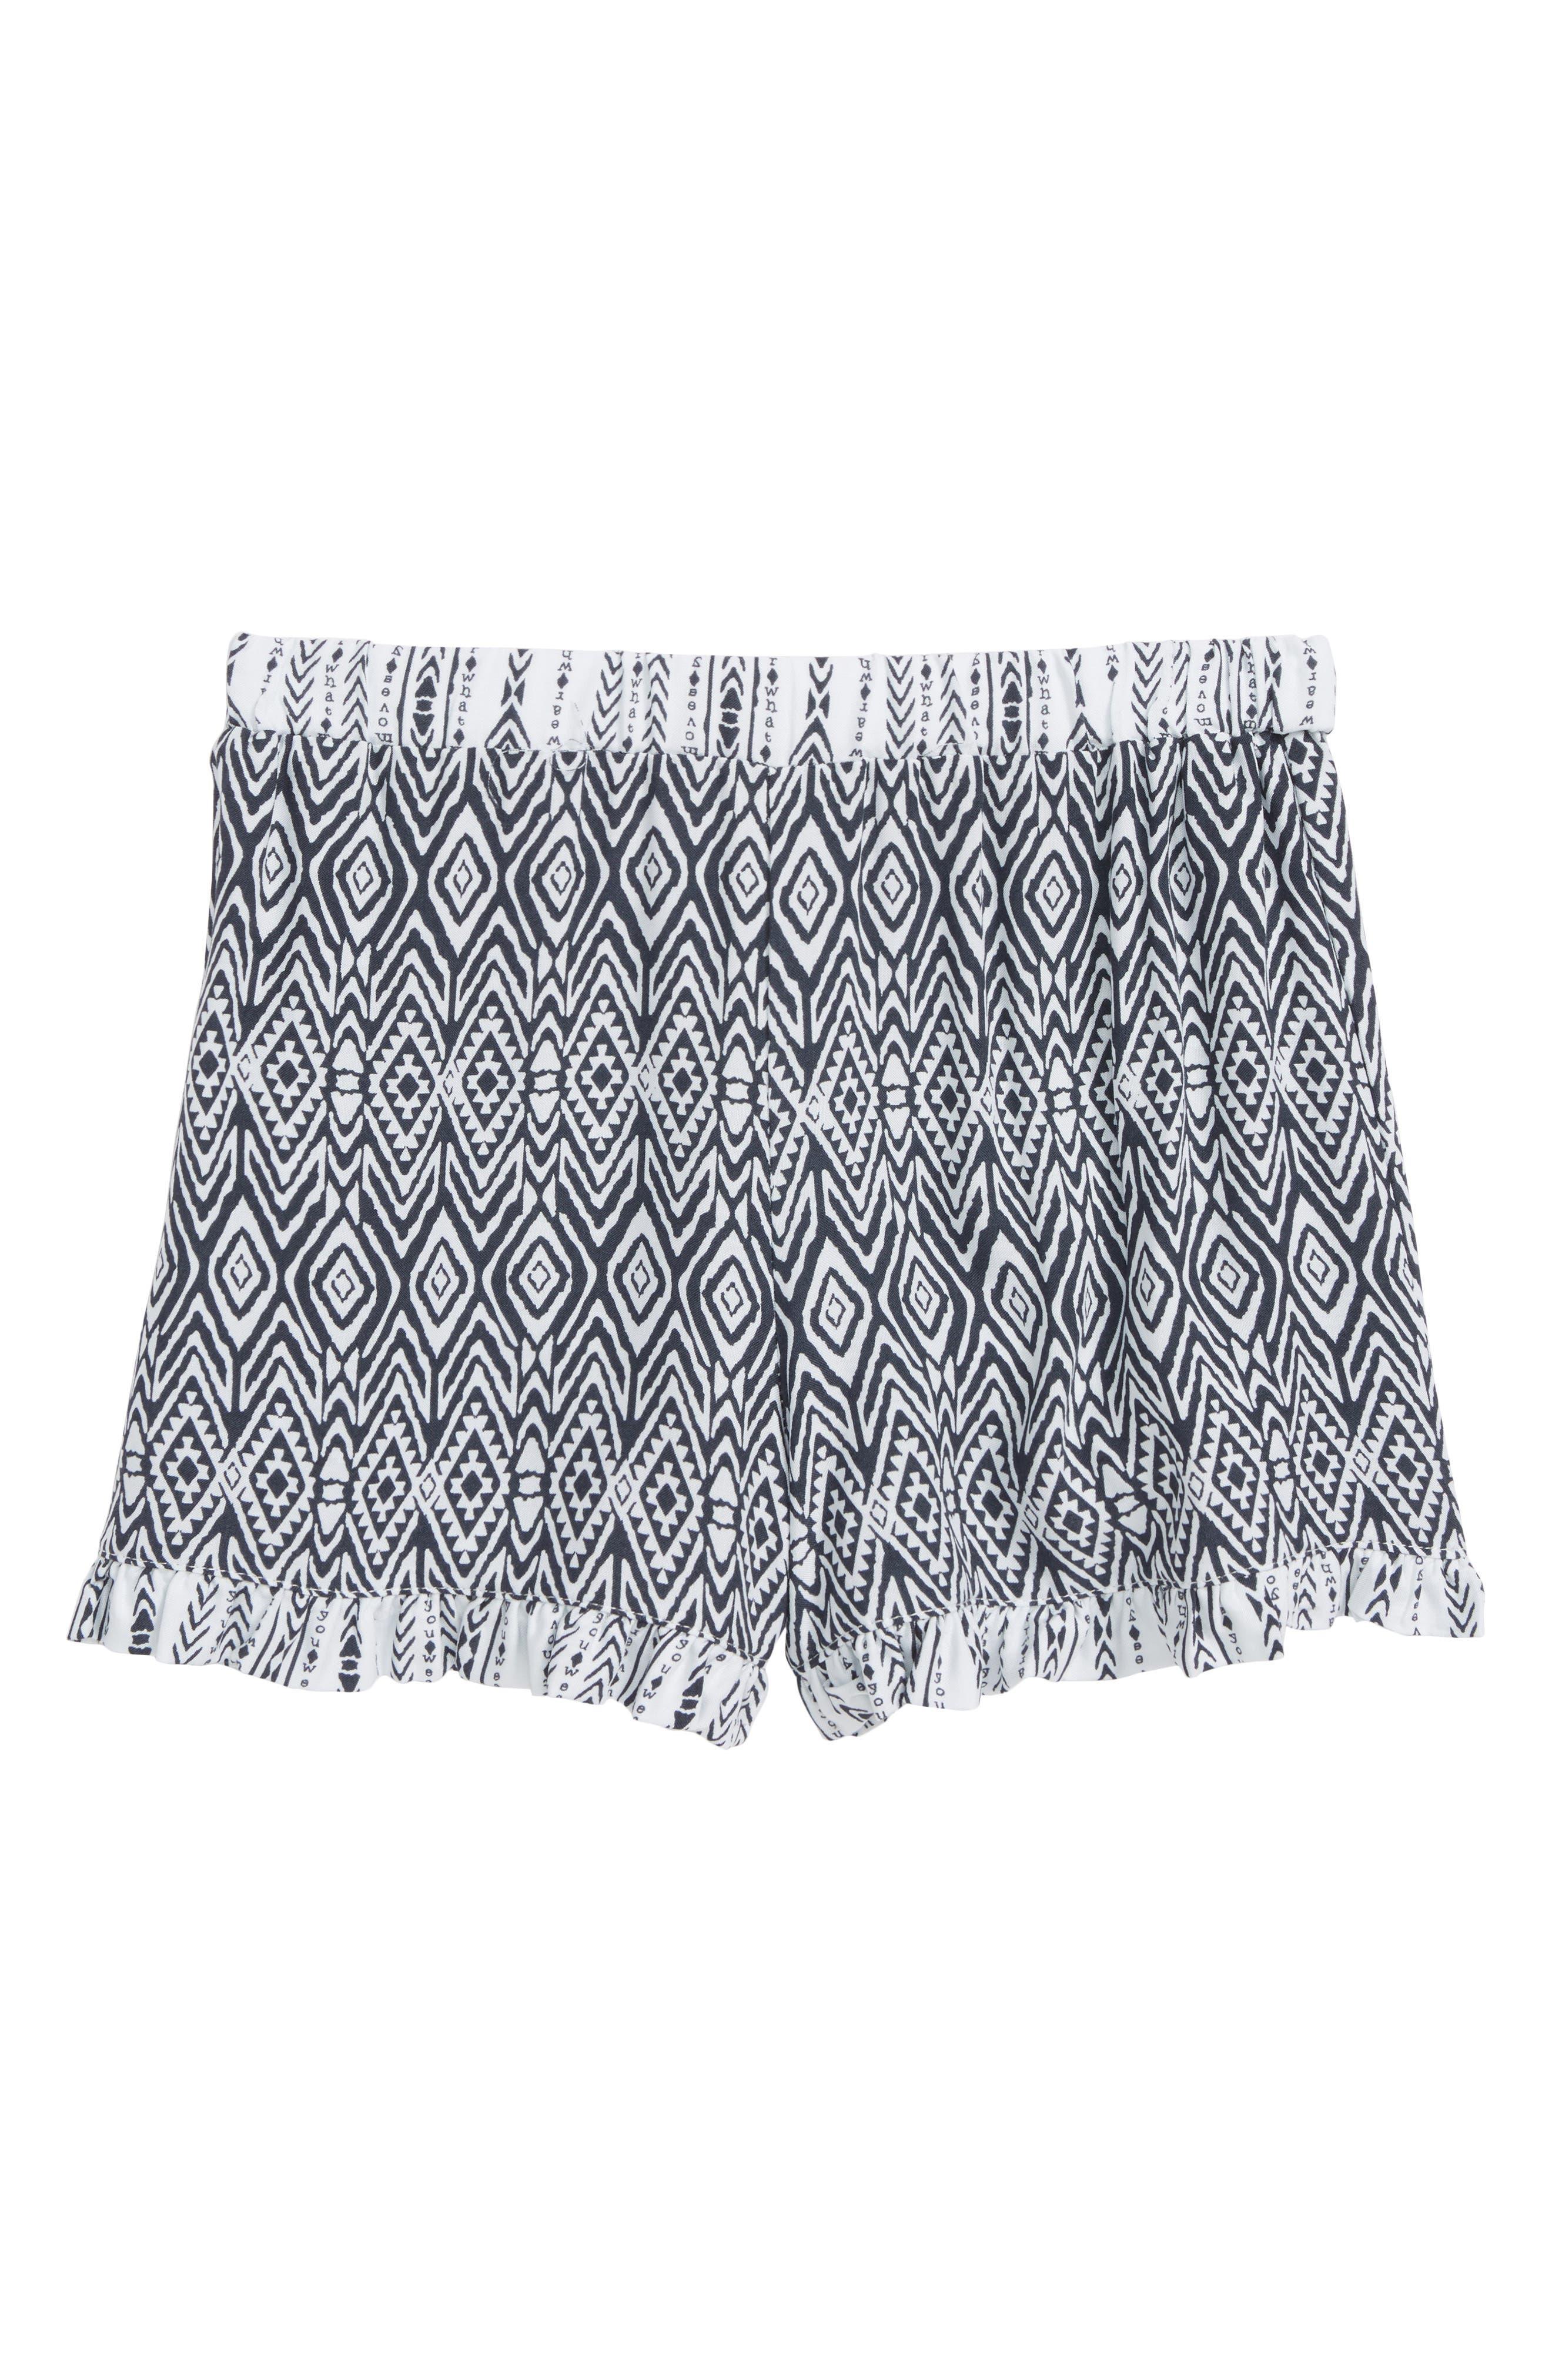 Tribal Print Shorts,                         Main,                         color, Navy/ White